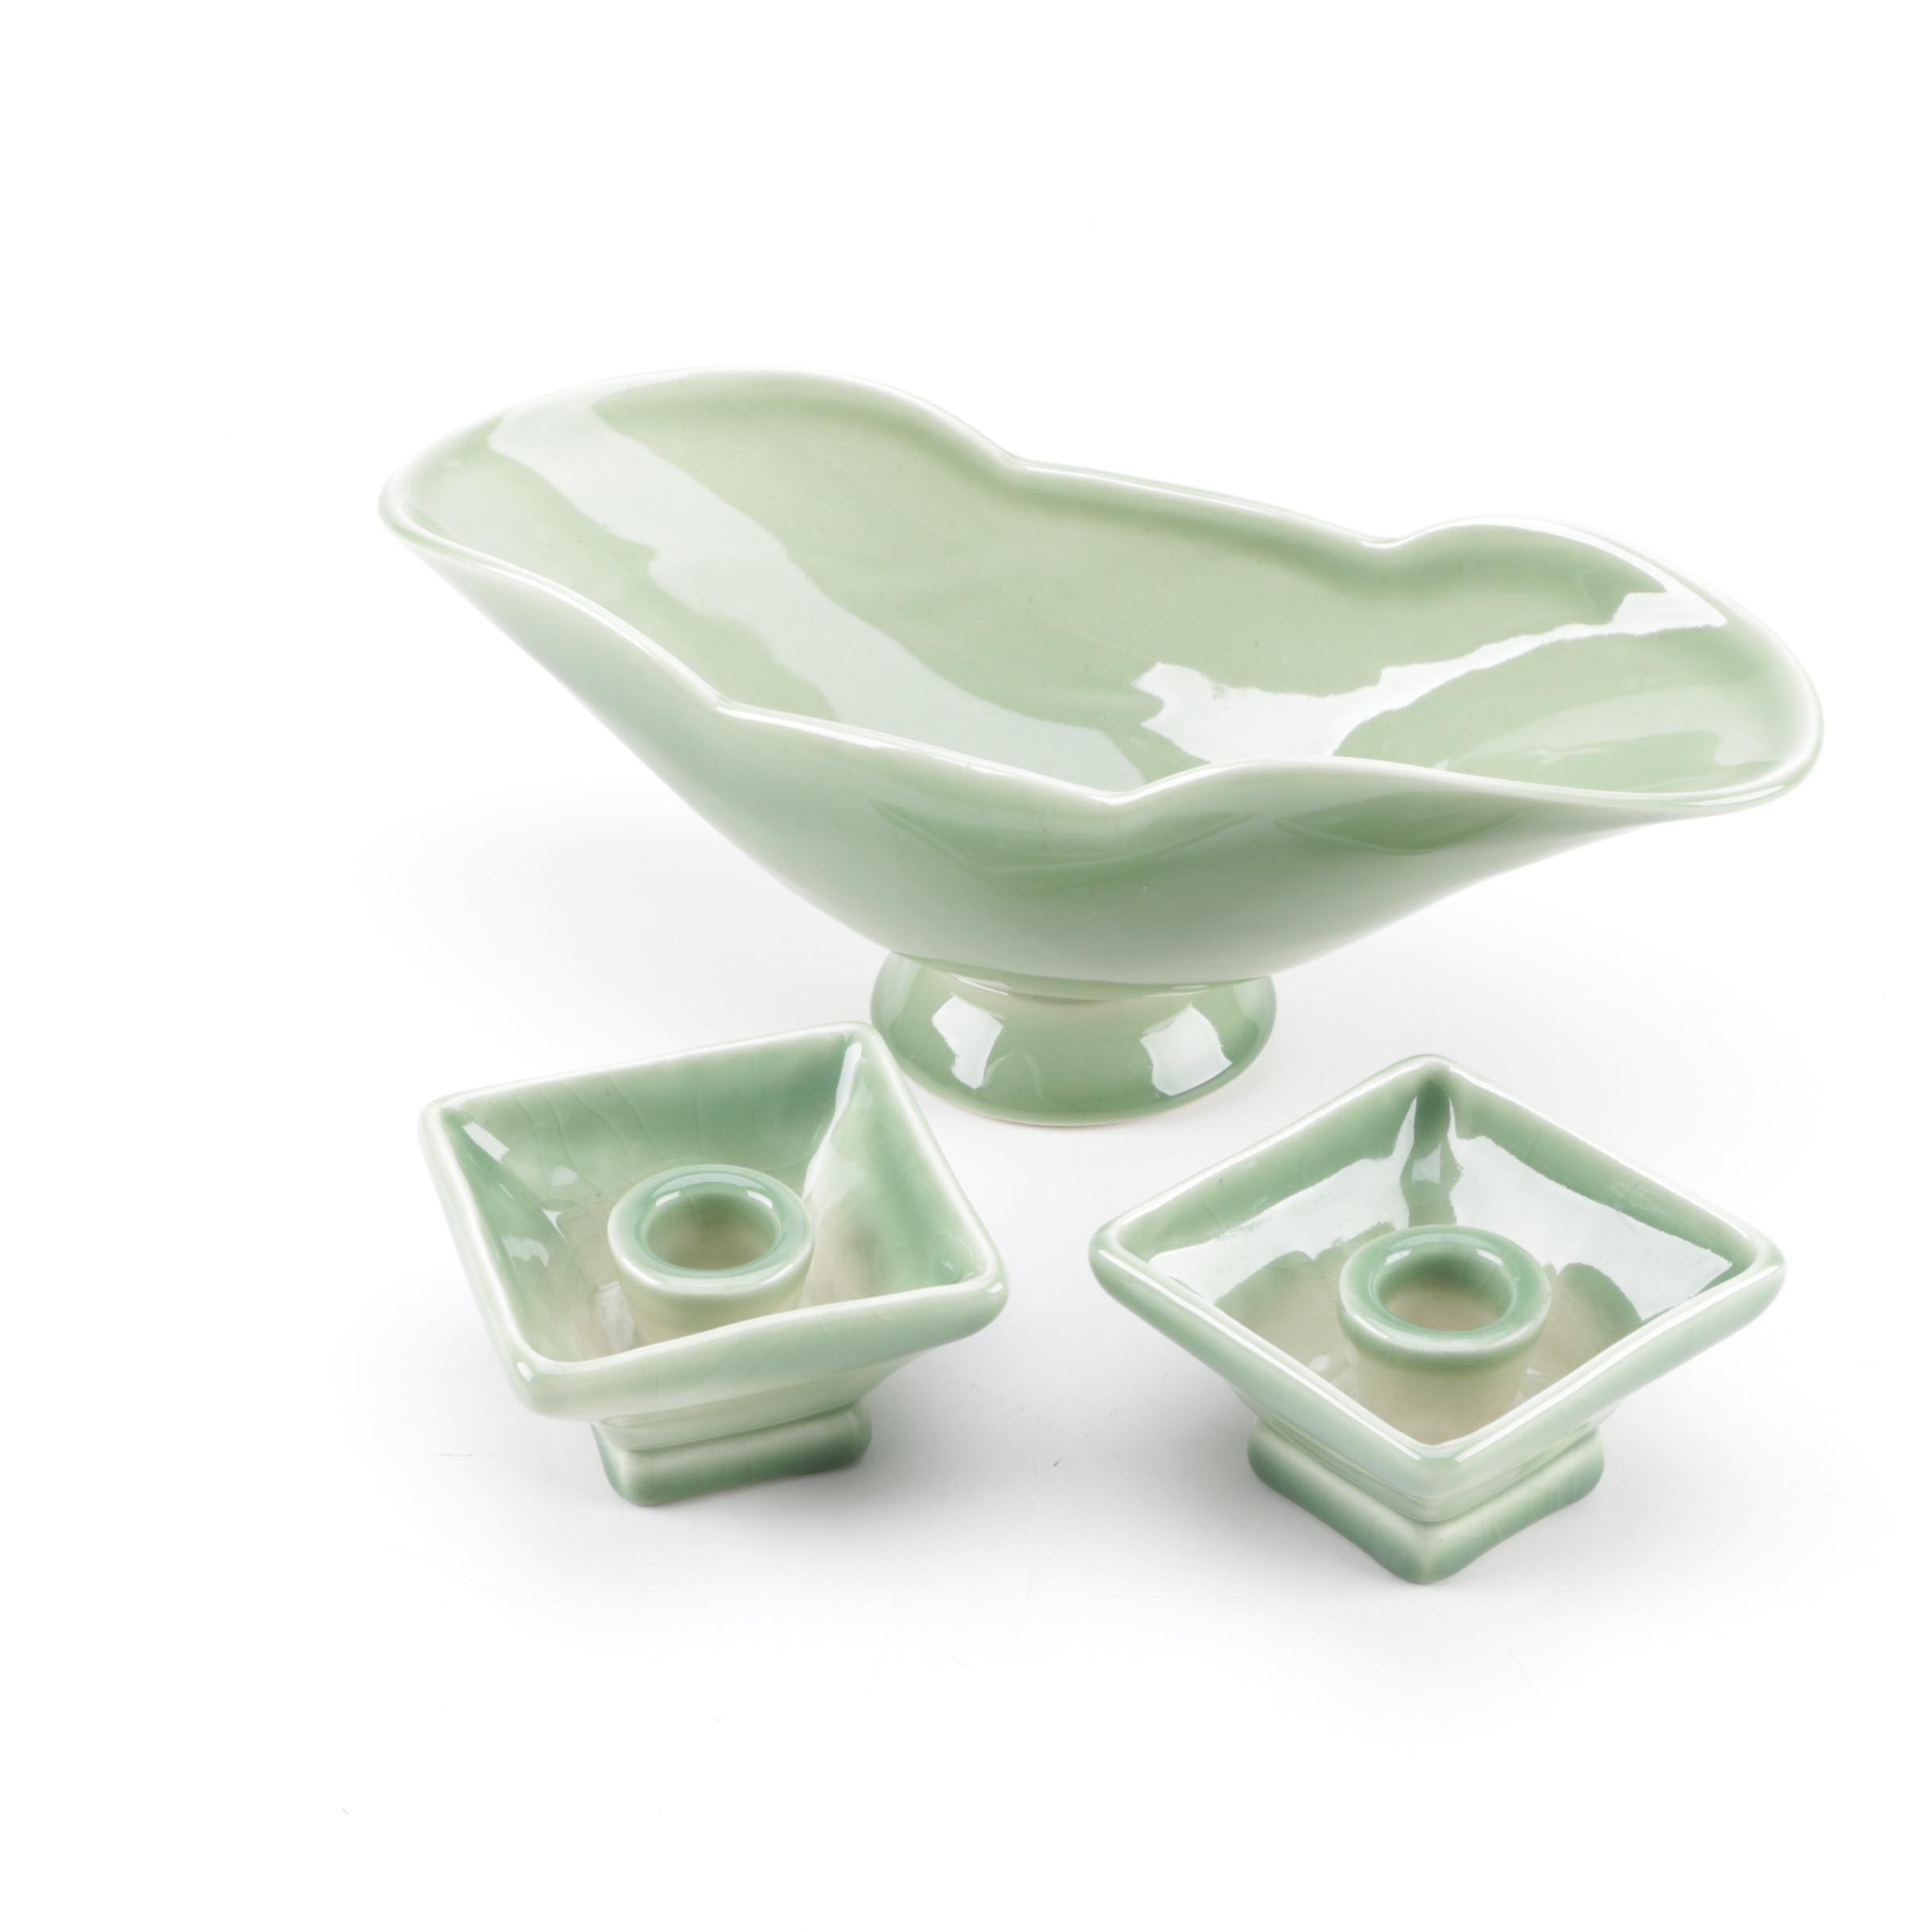 Green 1949 Rookwood Pottery Centerpiece Set #6826